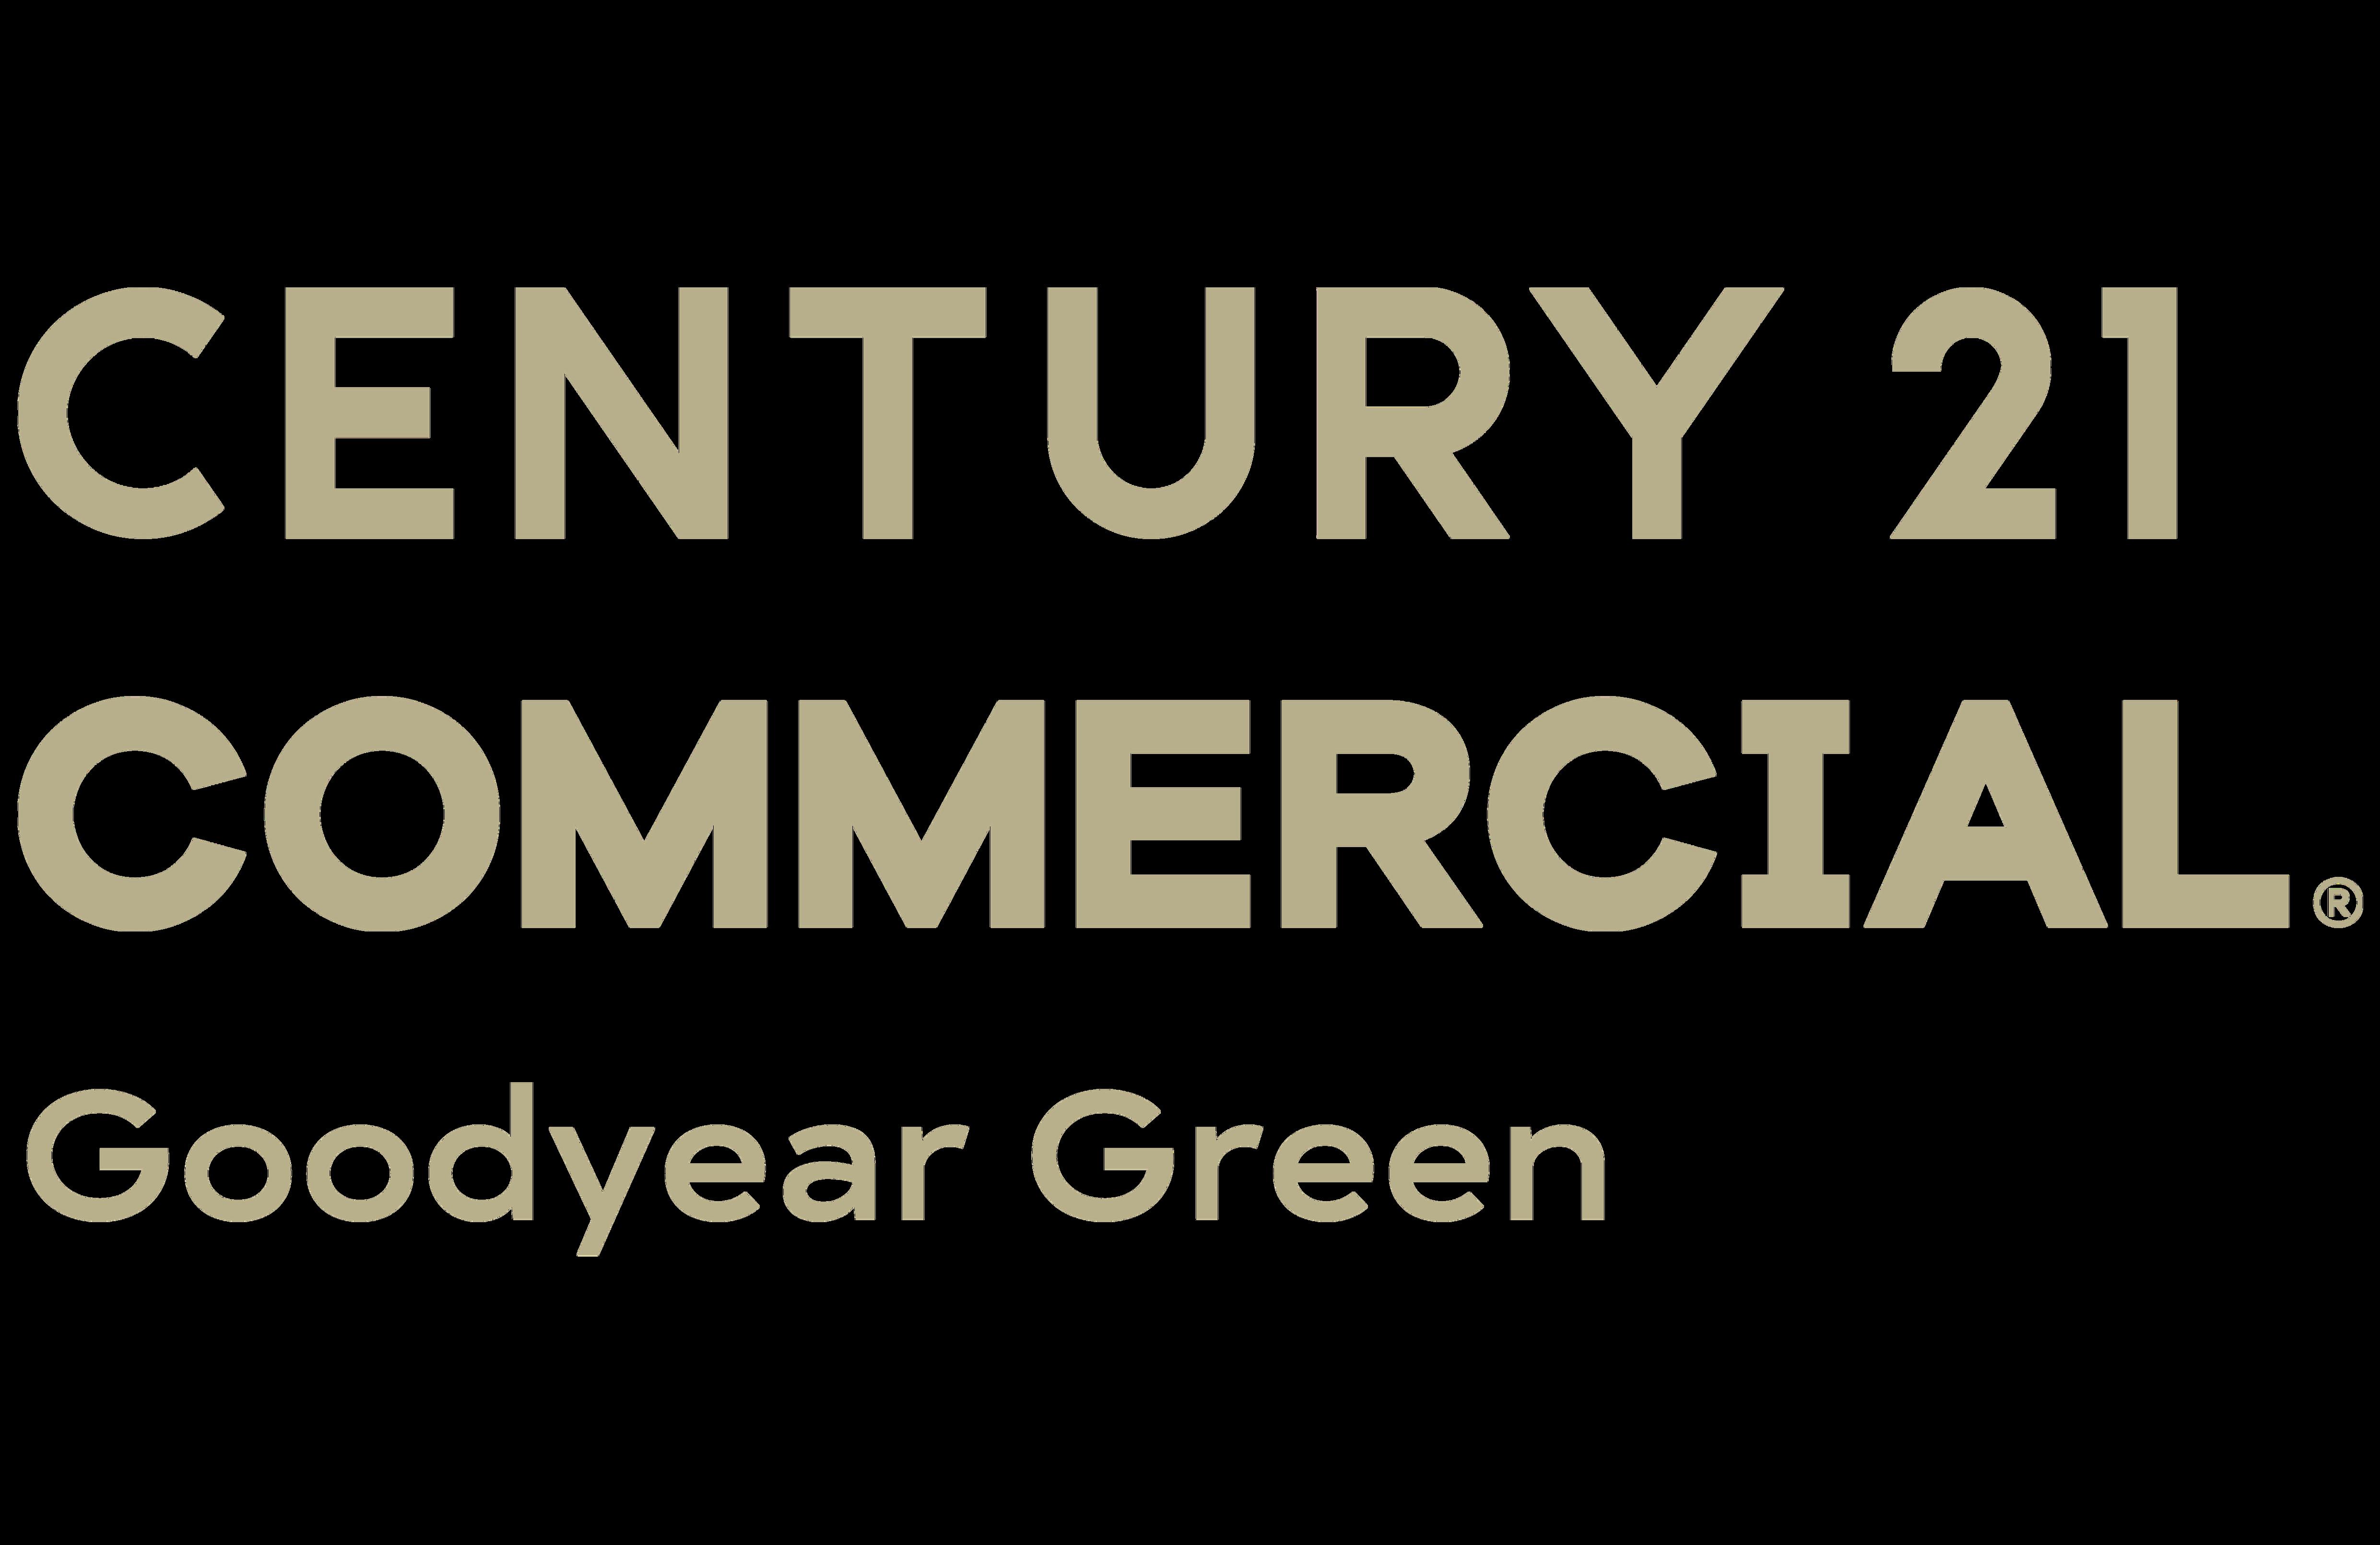 Steven Short of CENTURY 21 Goodyear Green logo